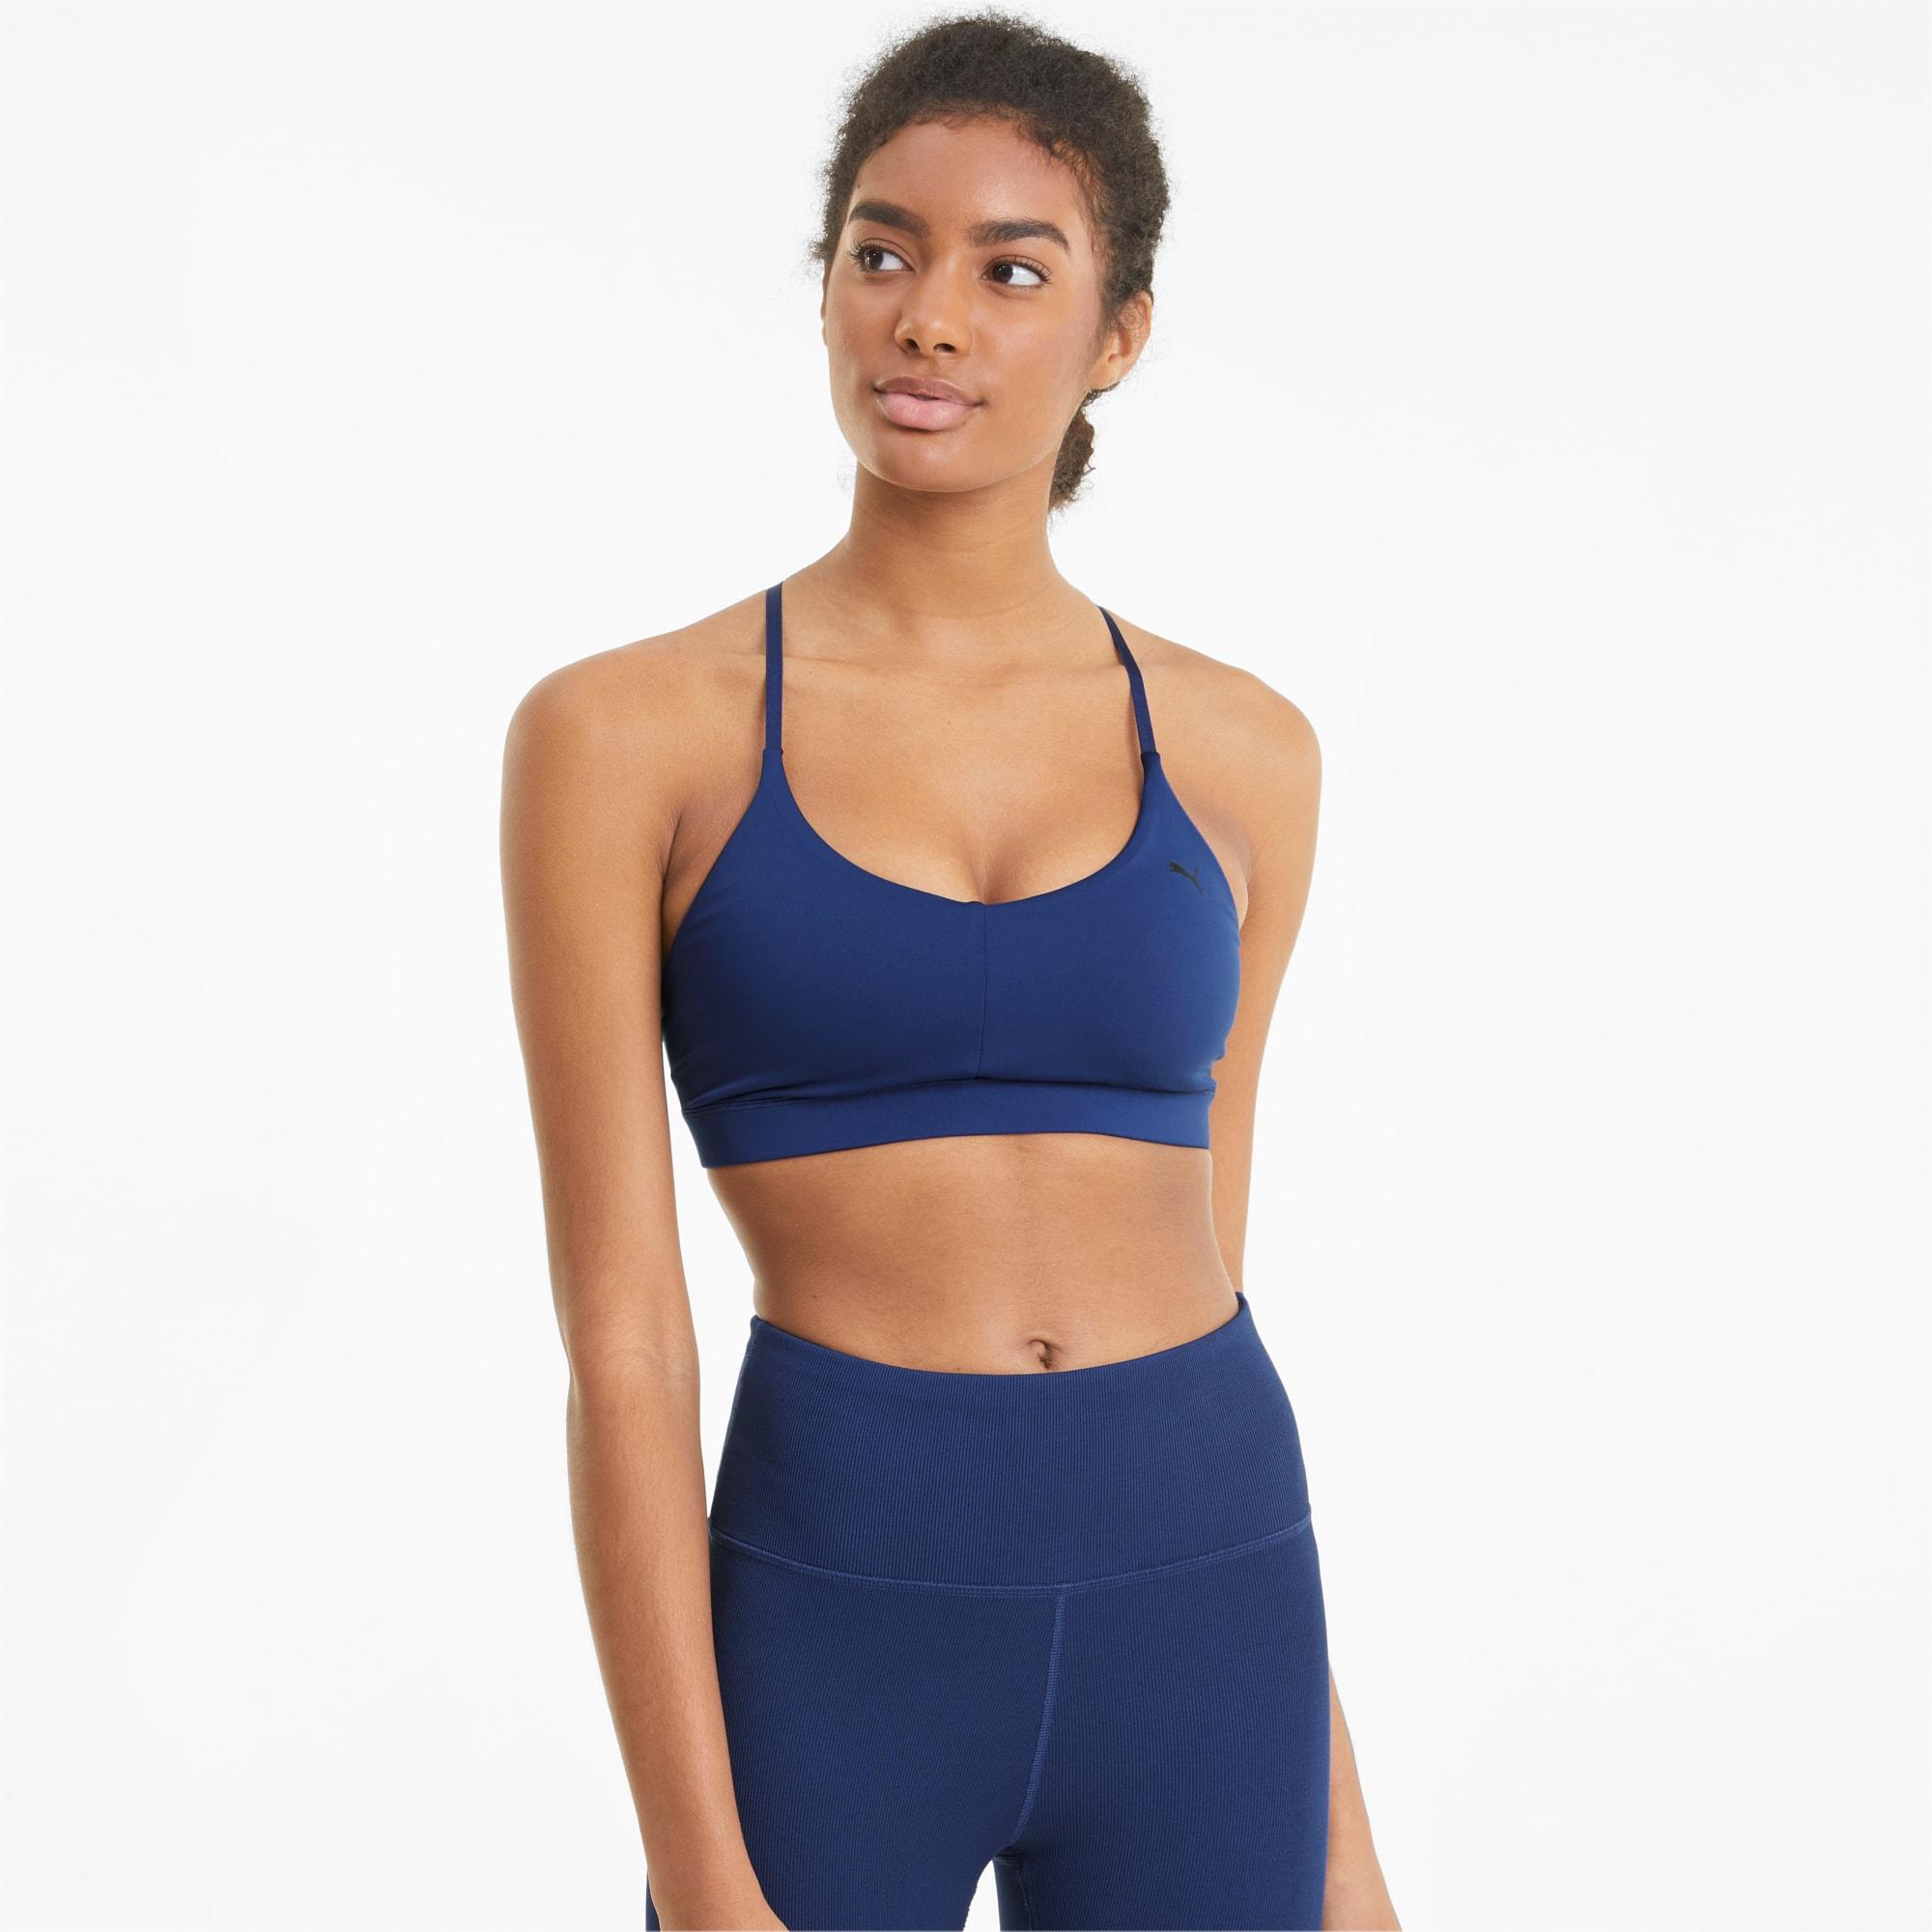 PUMA Low Impact Strappy Women's Training Bra, Elektro Blue, size Small, Clothing